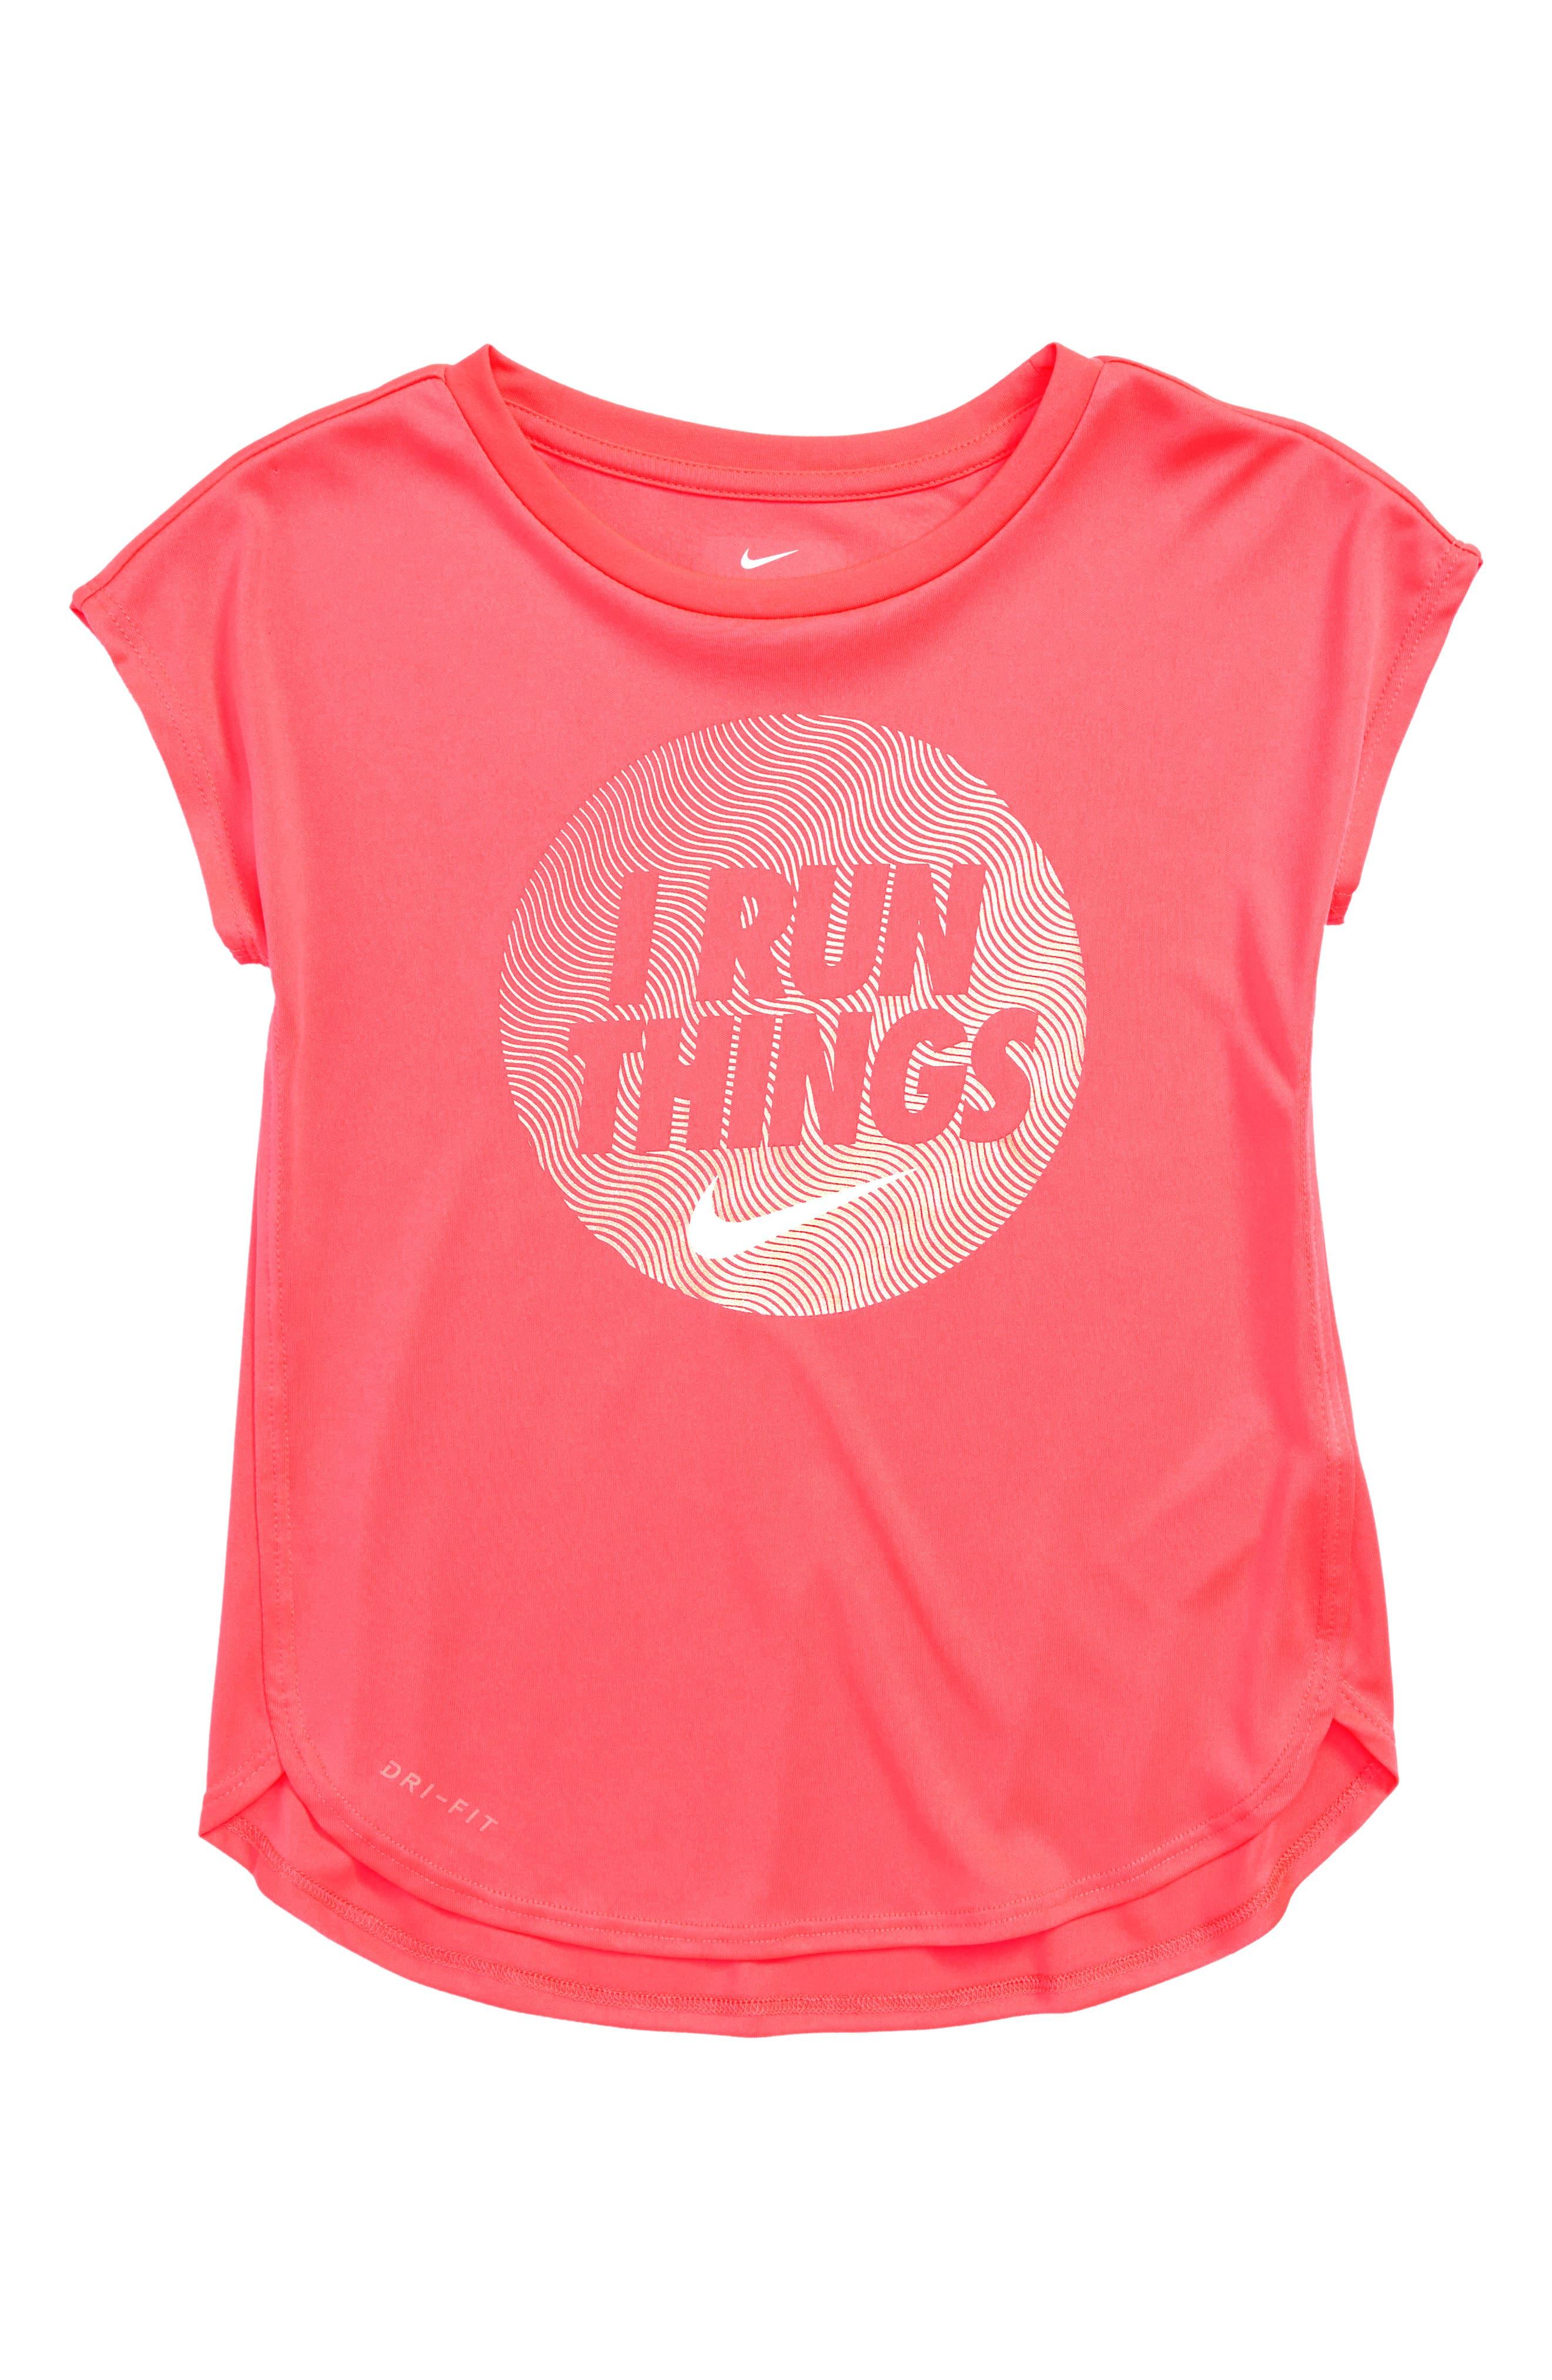 Dry I Run Things Tee,                             Main thumbnail 1, color,                             Racer Pink